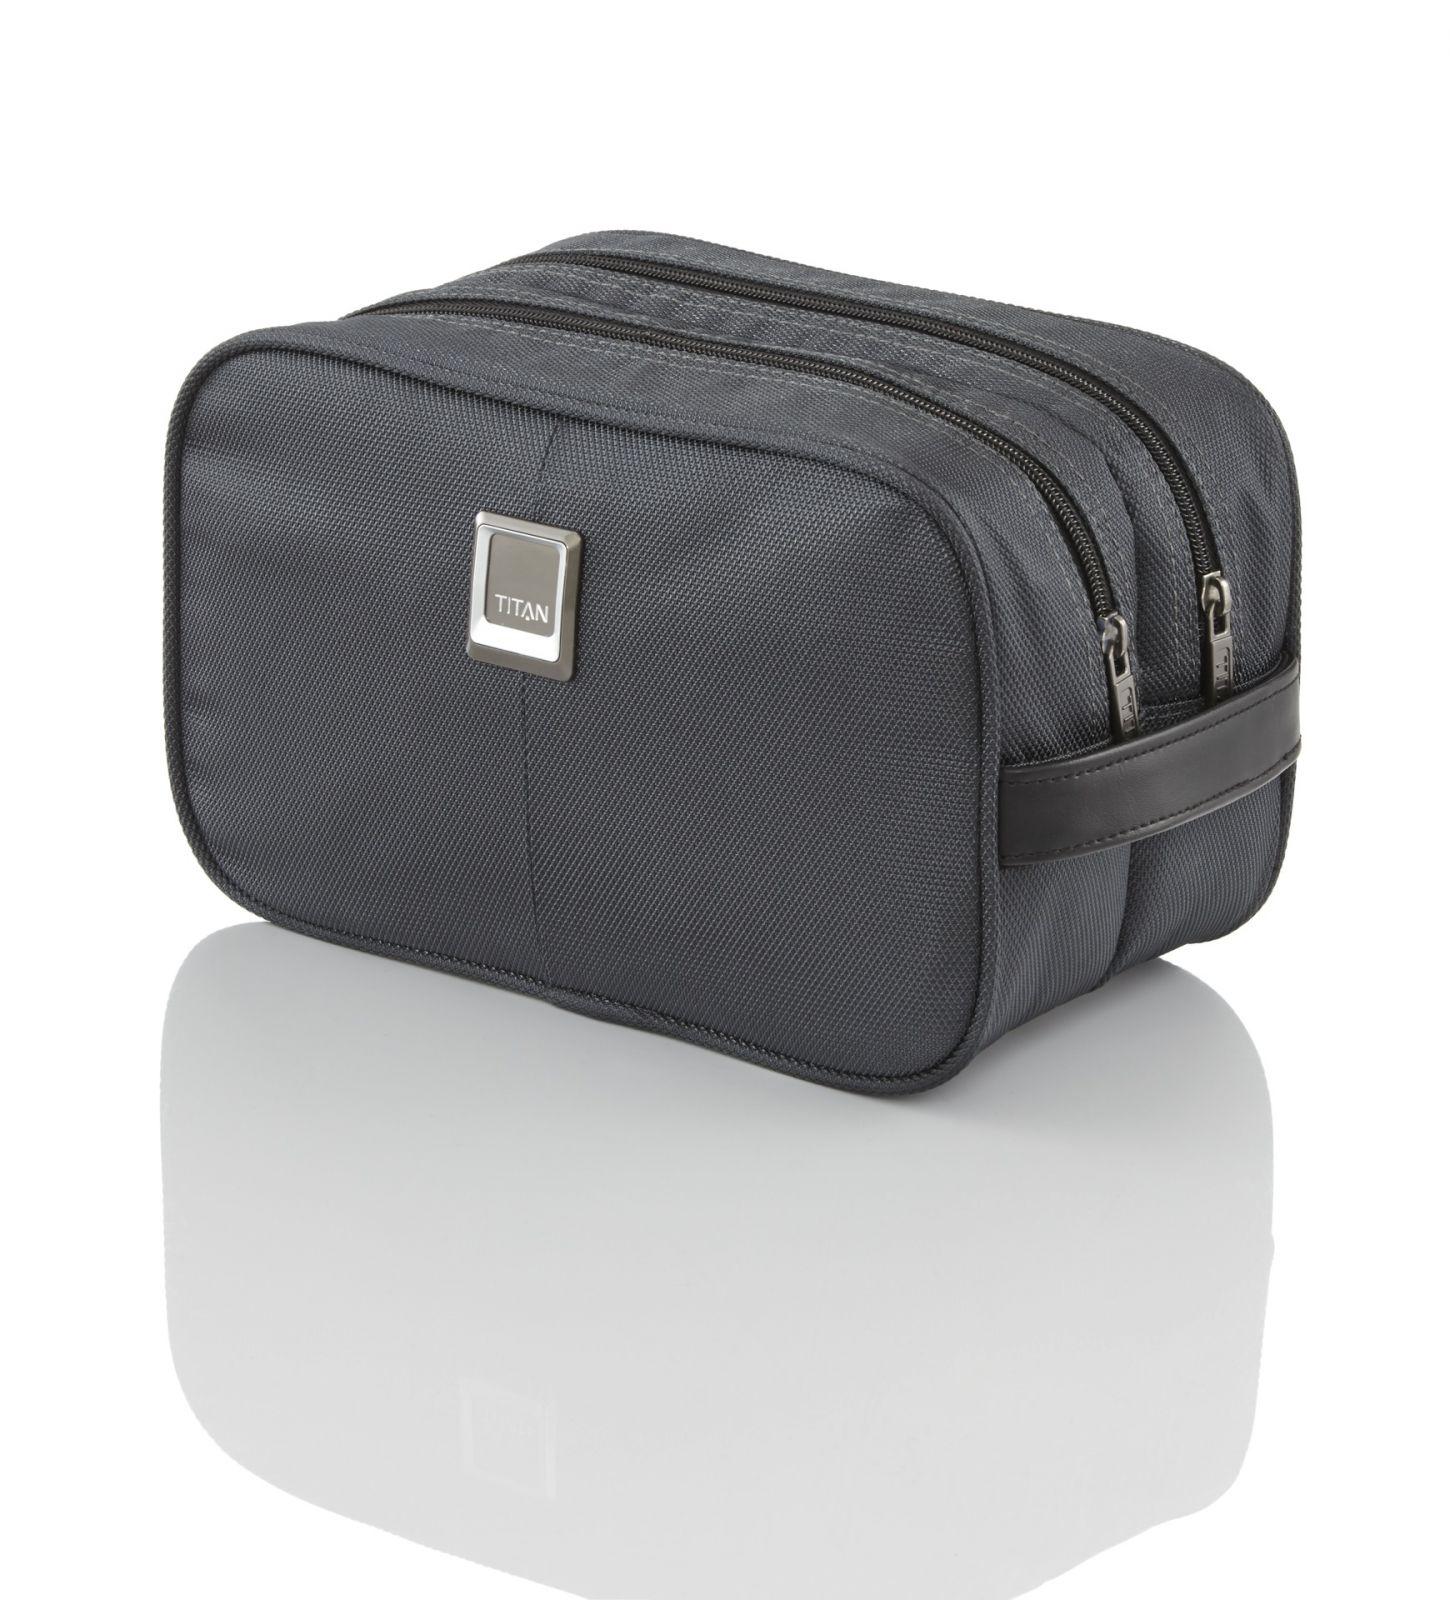 Titan Nonstop Cosmetic Bag Anthracite